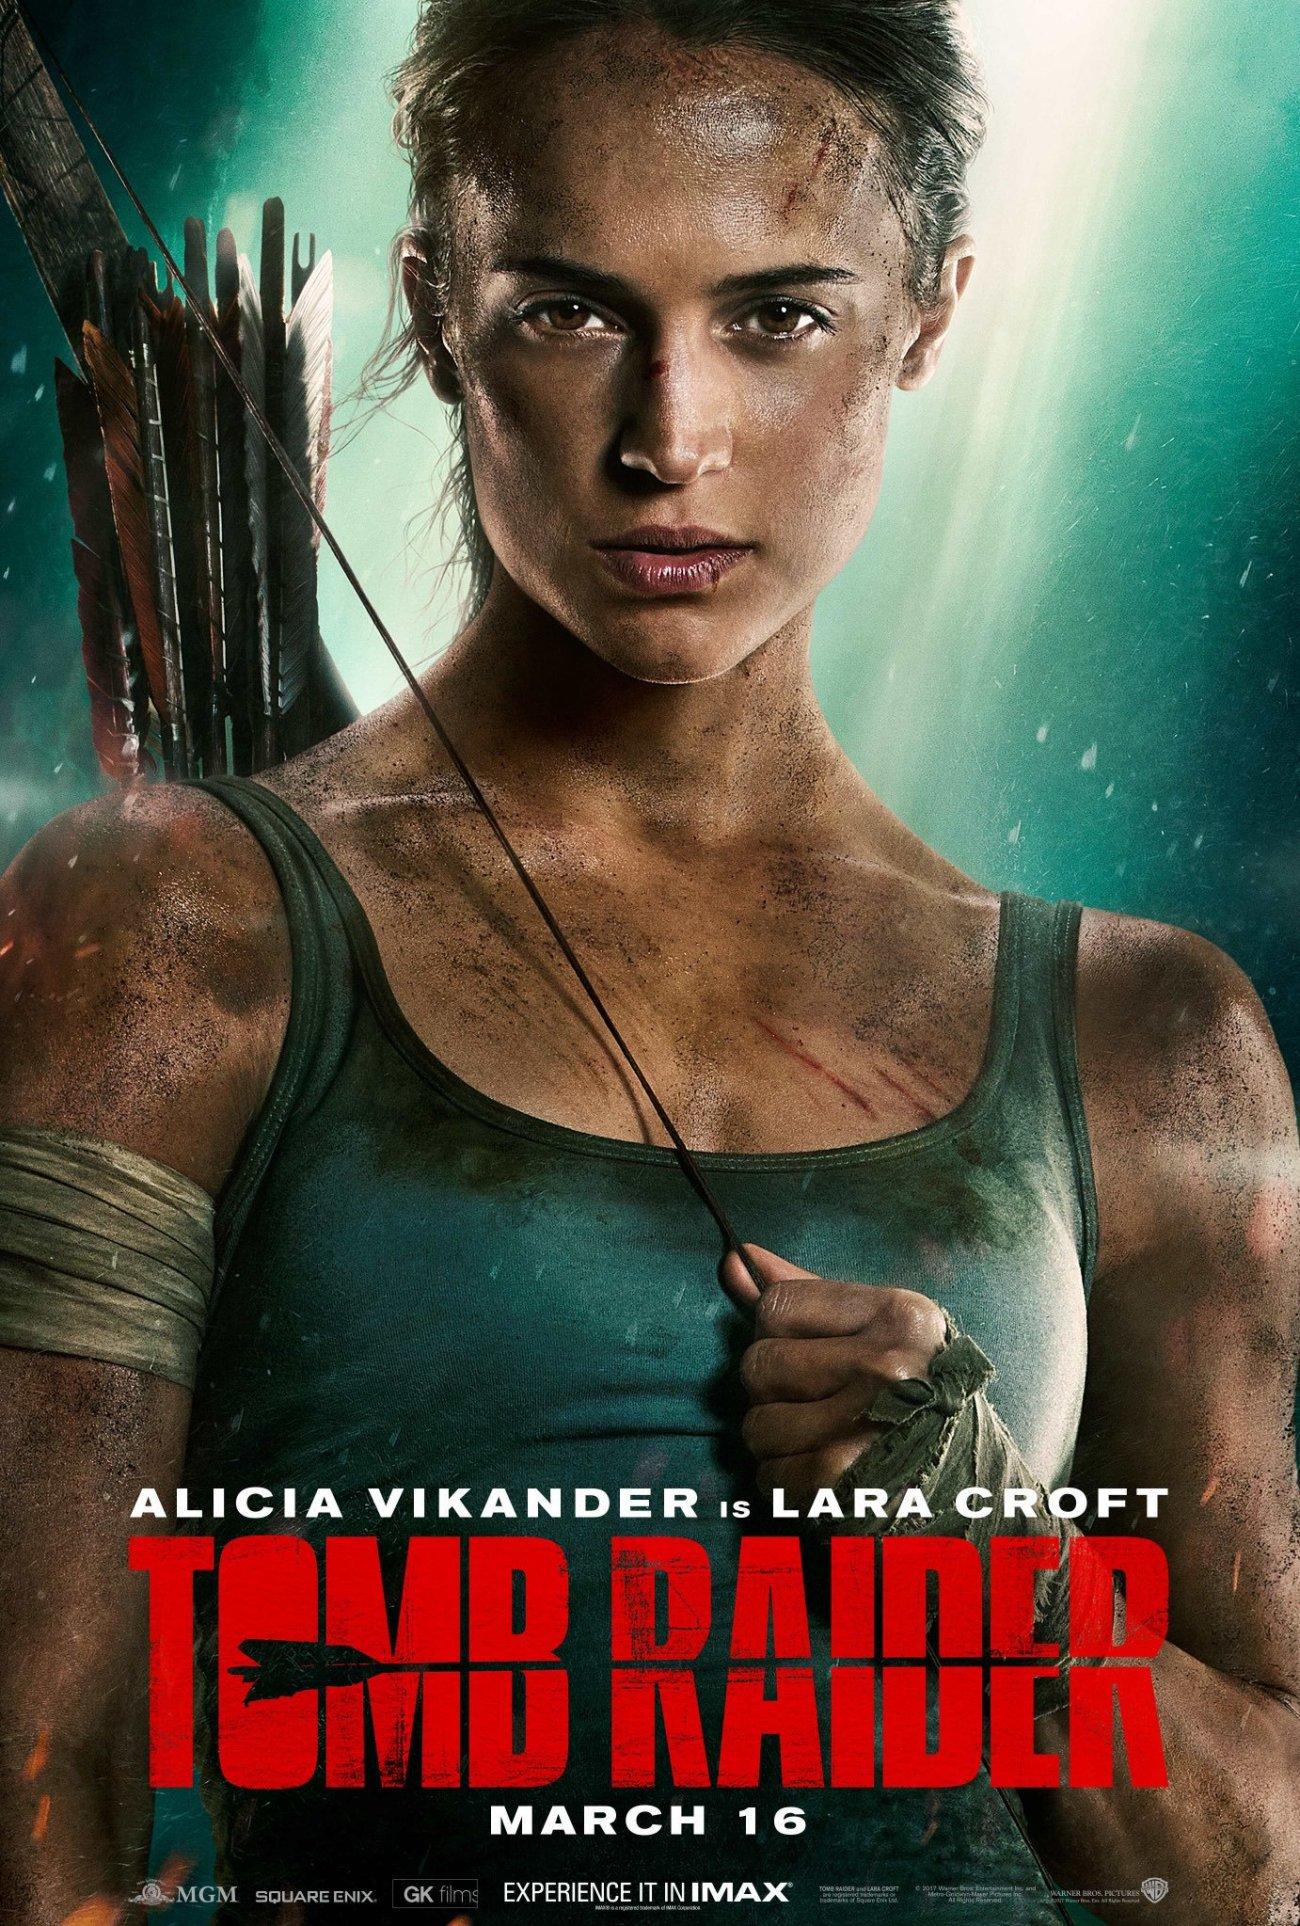 Póster IMAX de Tomb Raider (2018). Imagen: Tomb Raider Twitter (@TombRaiderMovie).